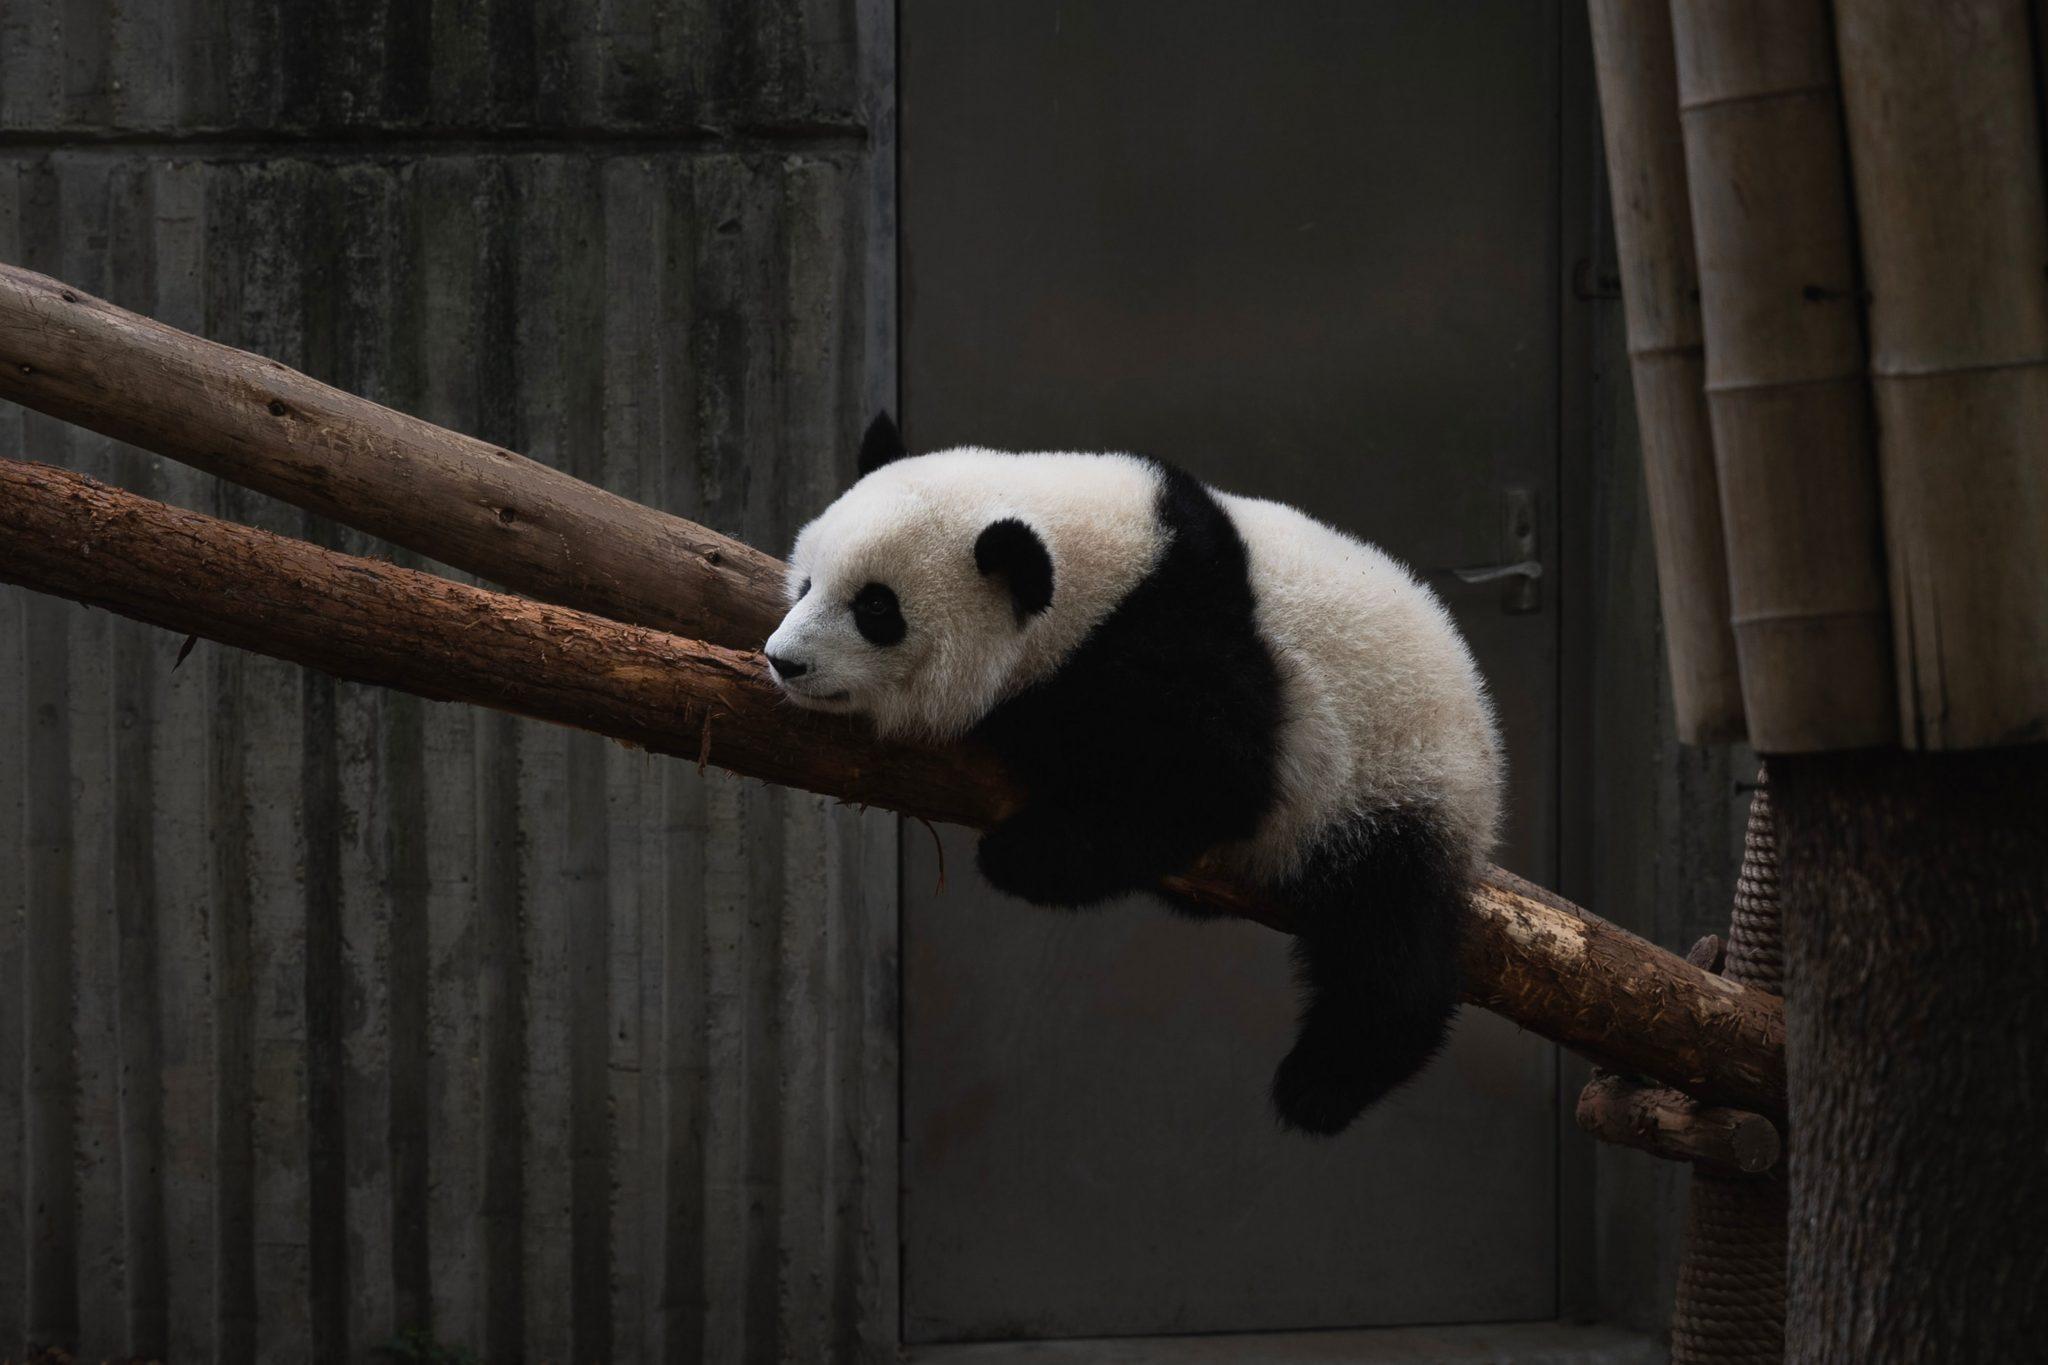 Panda 4.0: Quality Vs. Quantity